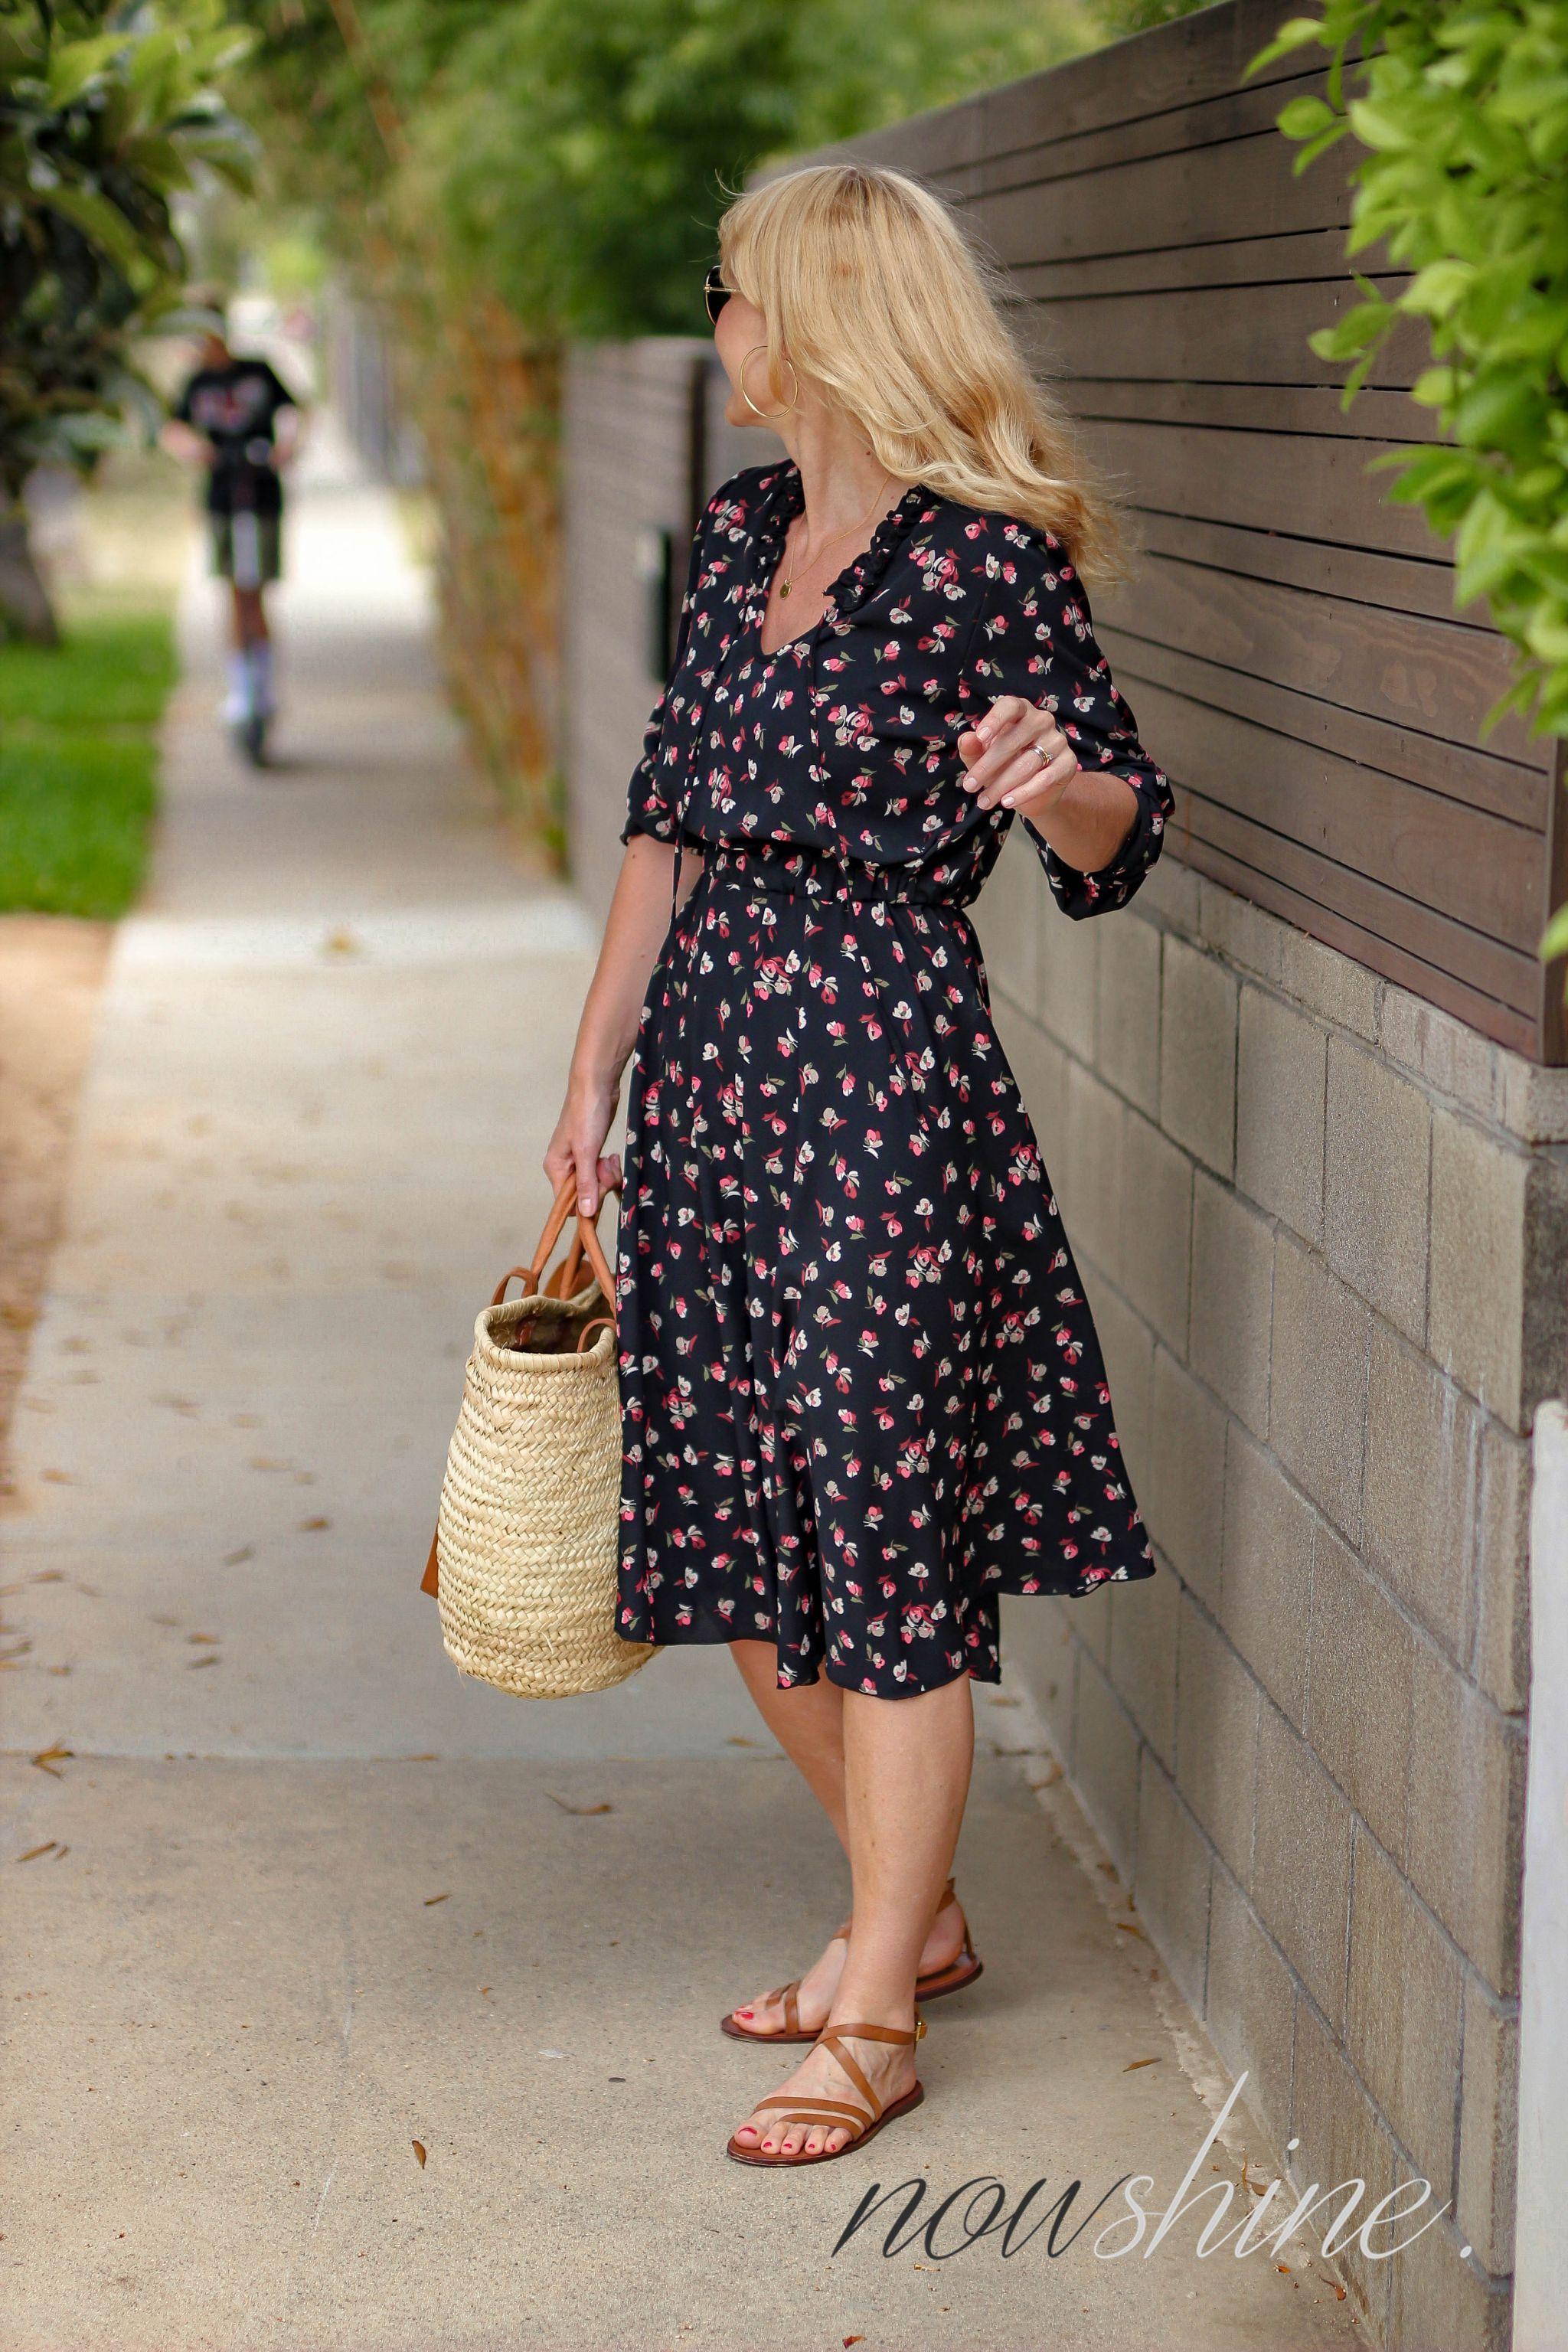 aa3b1f1d0be7f7 Aus dem WENZ Katalog: Knielanges Kleid für das Cali-Feeling | Nowshine